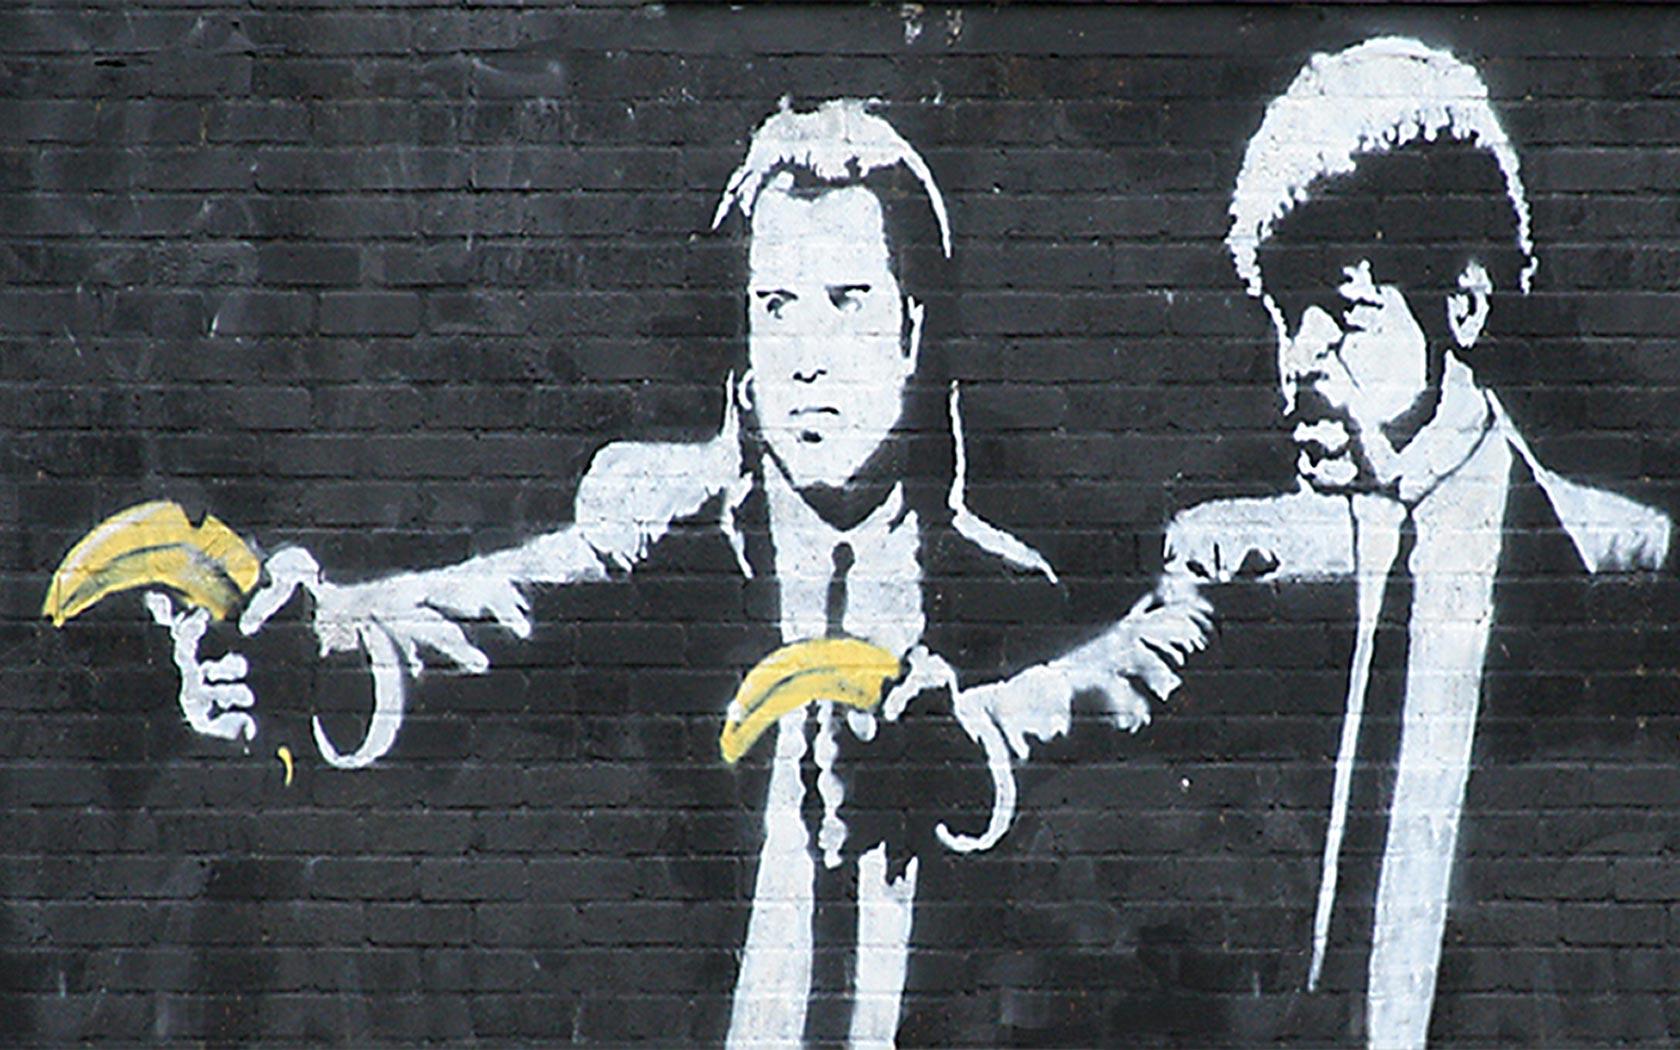 02-banksy-pulp-fiction.jpg